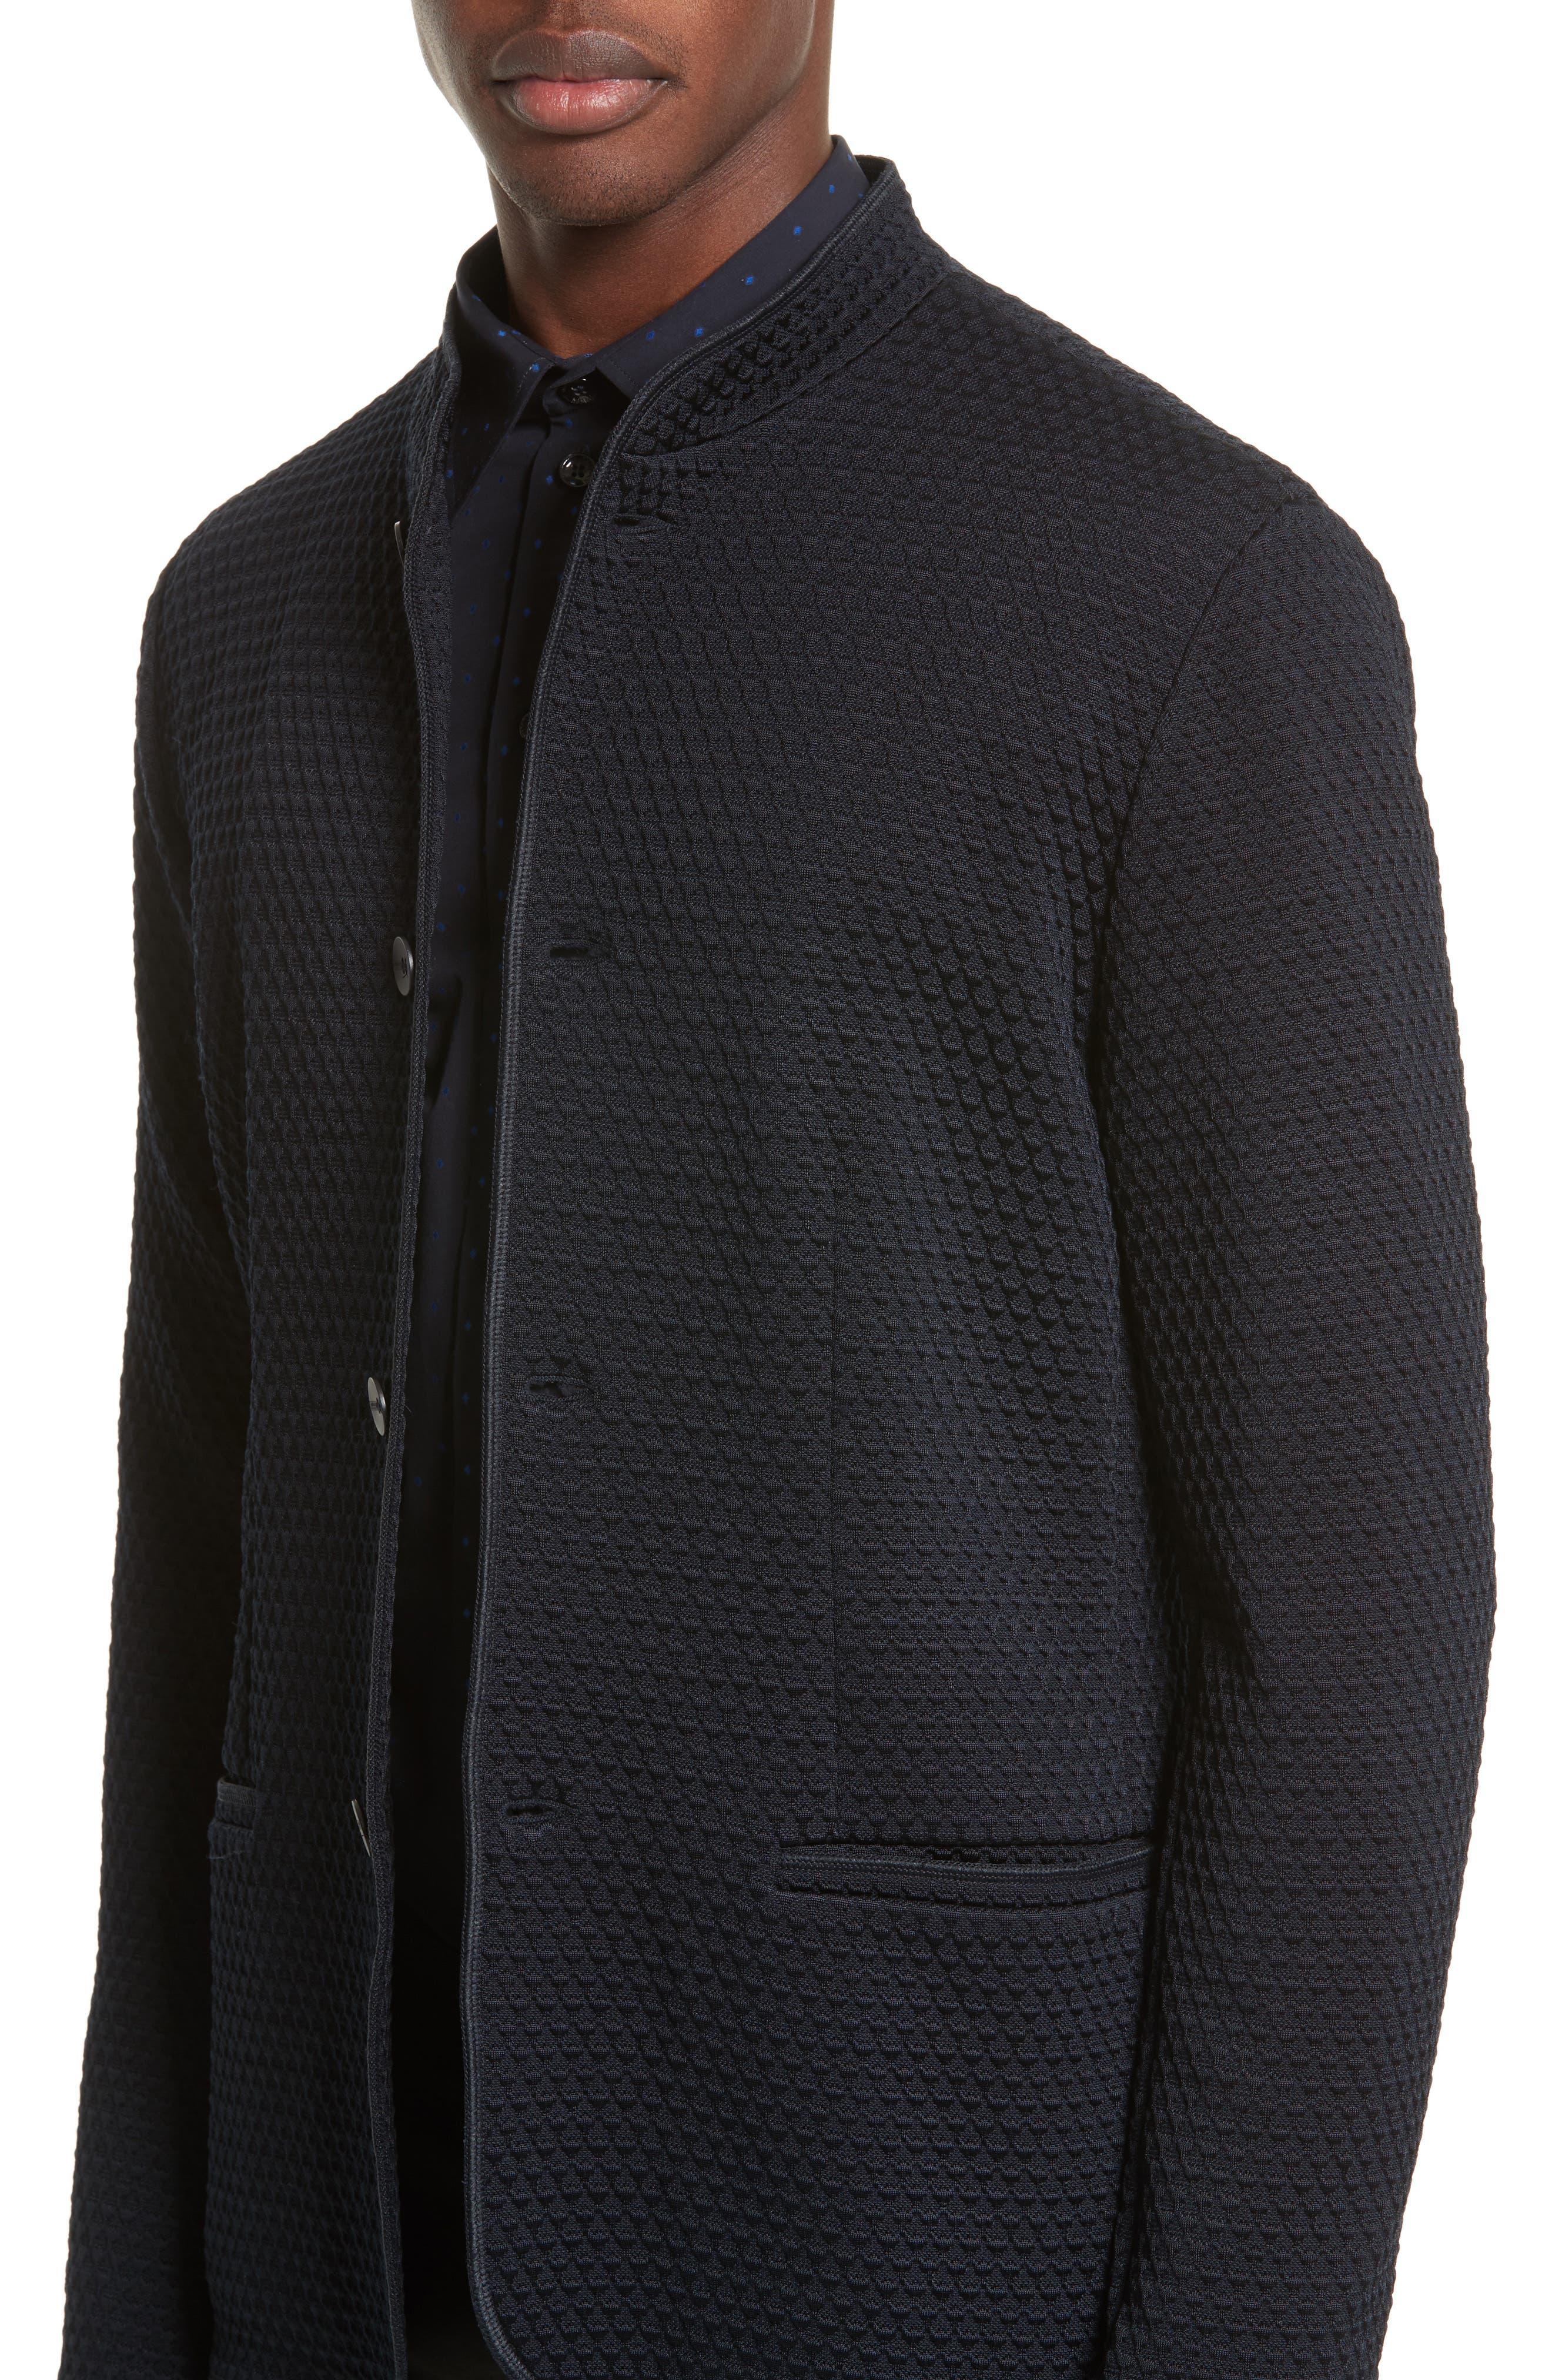 Jacquard Button Front Sweater,                             Alternate thumbnail 4, color,                             414